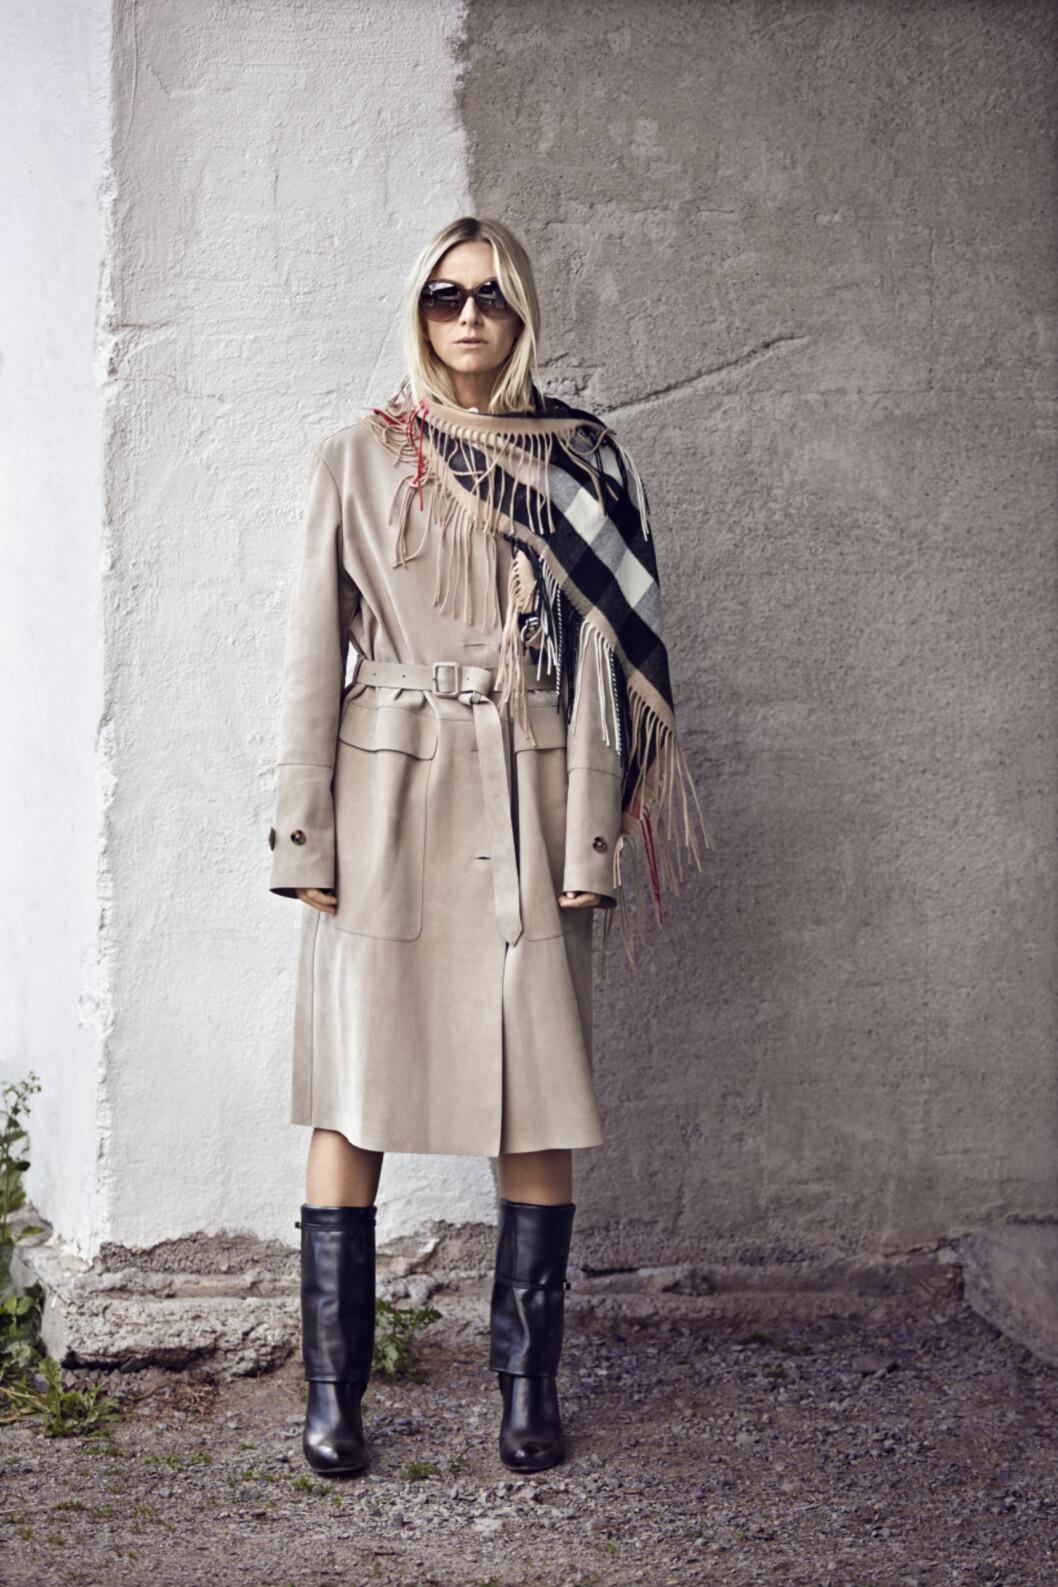 Profilert moteblogger i ny kampanje: Celine Aagaard sin favorittlook fra kampanjen. Klassisk trenchcoat og kasjmirskjerf i Burberrys ikoniske mønster.  Foto: Truls Qvale/Burberry